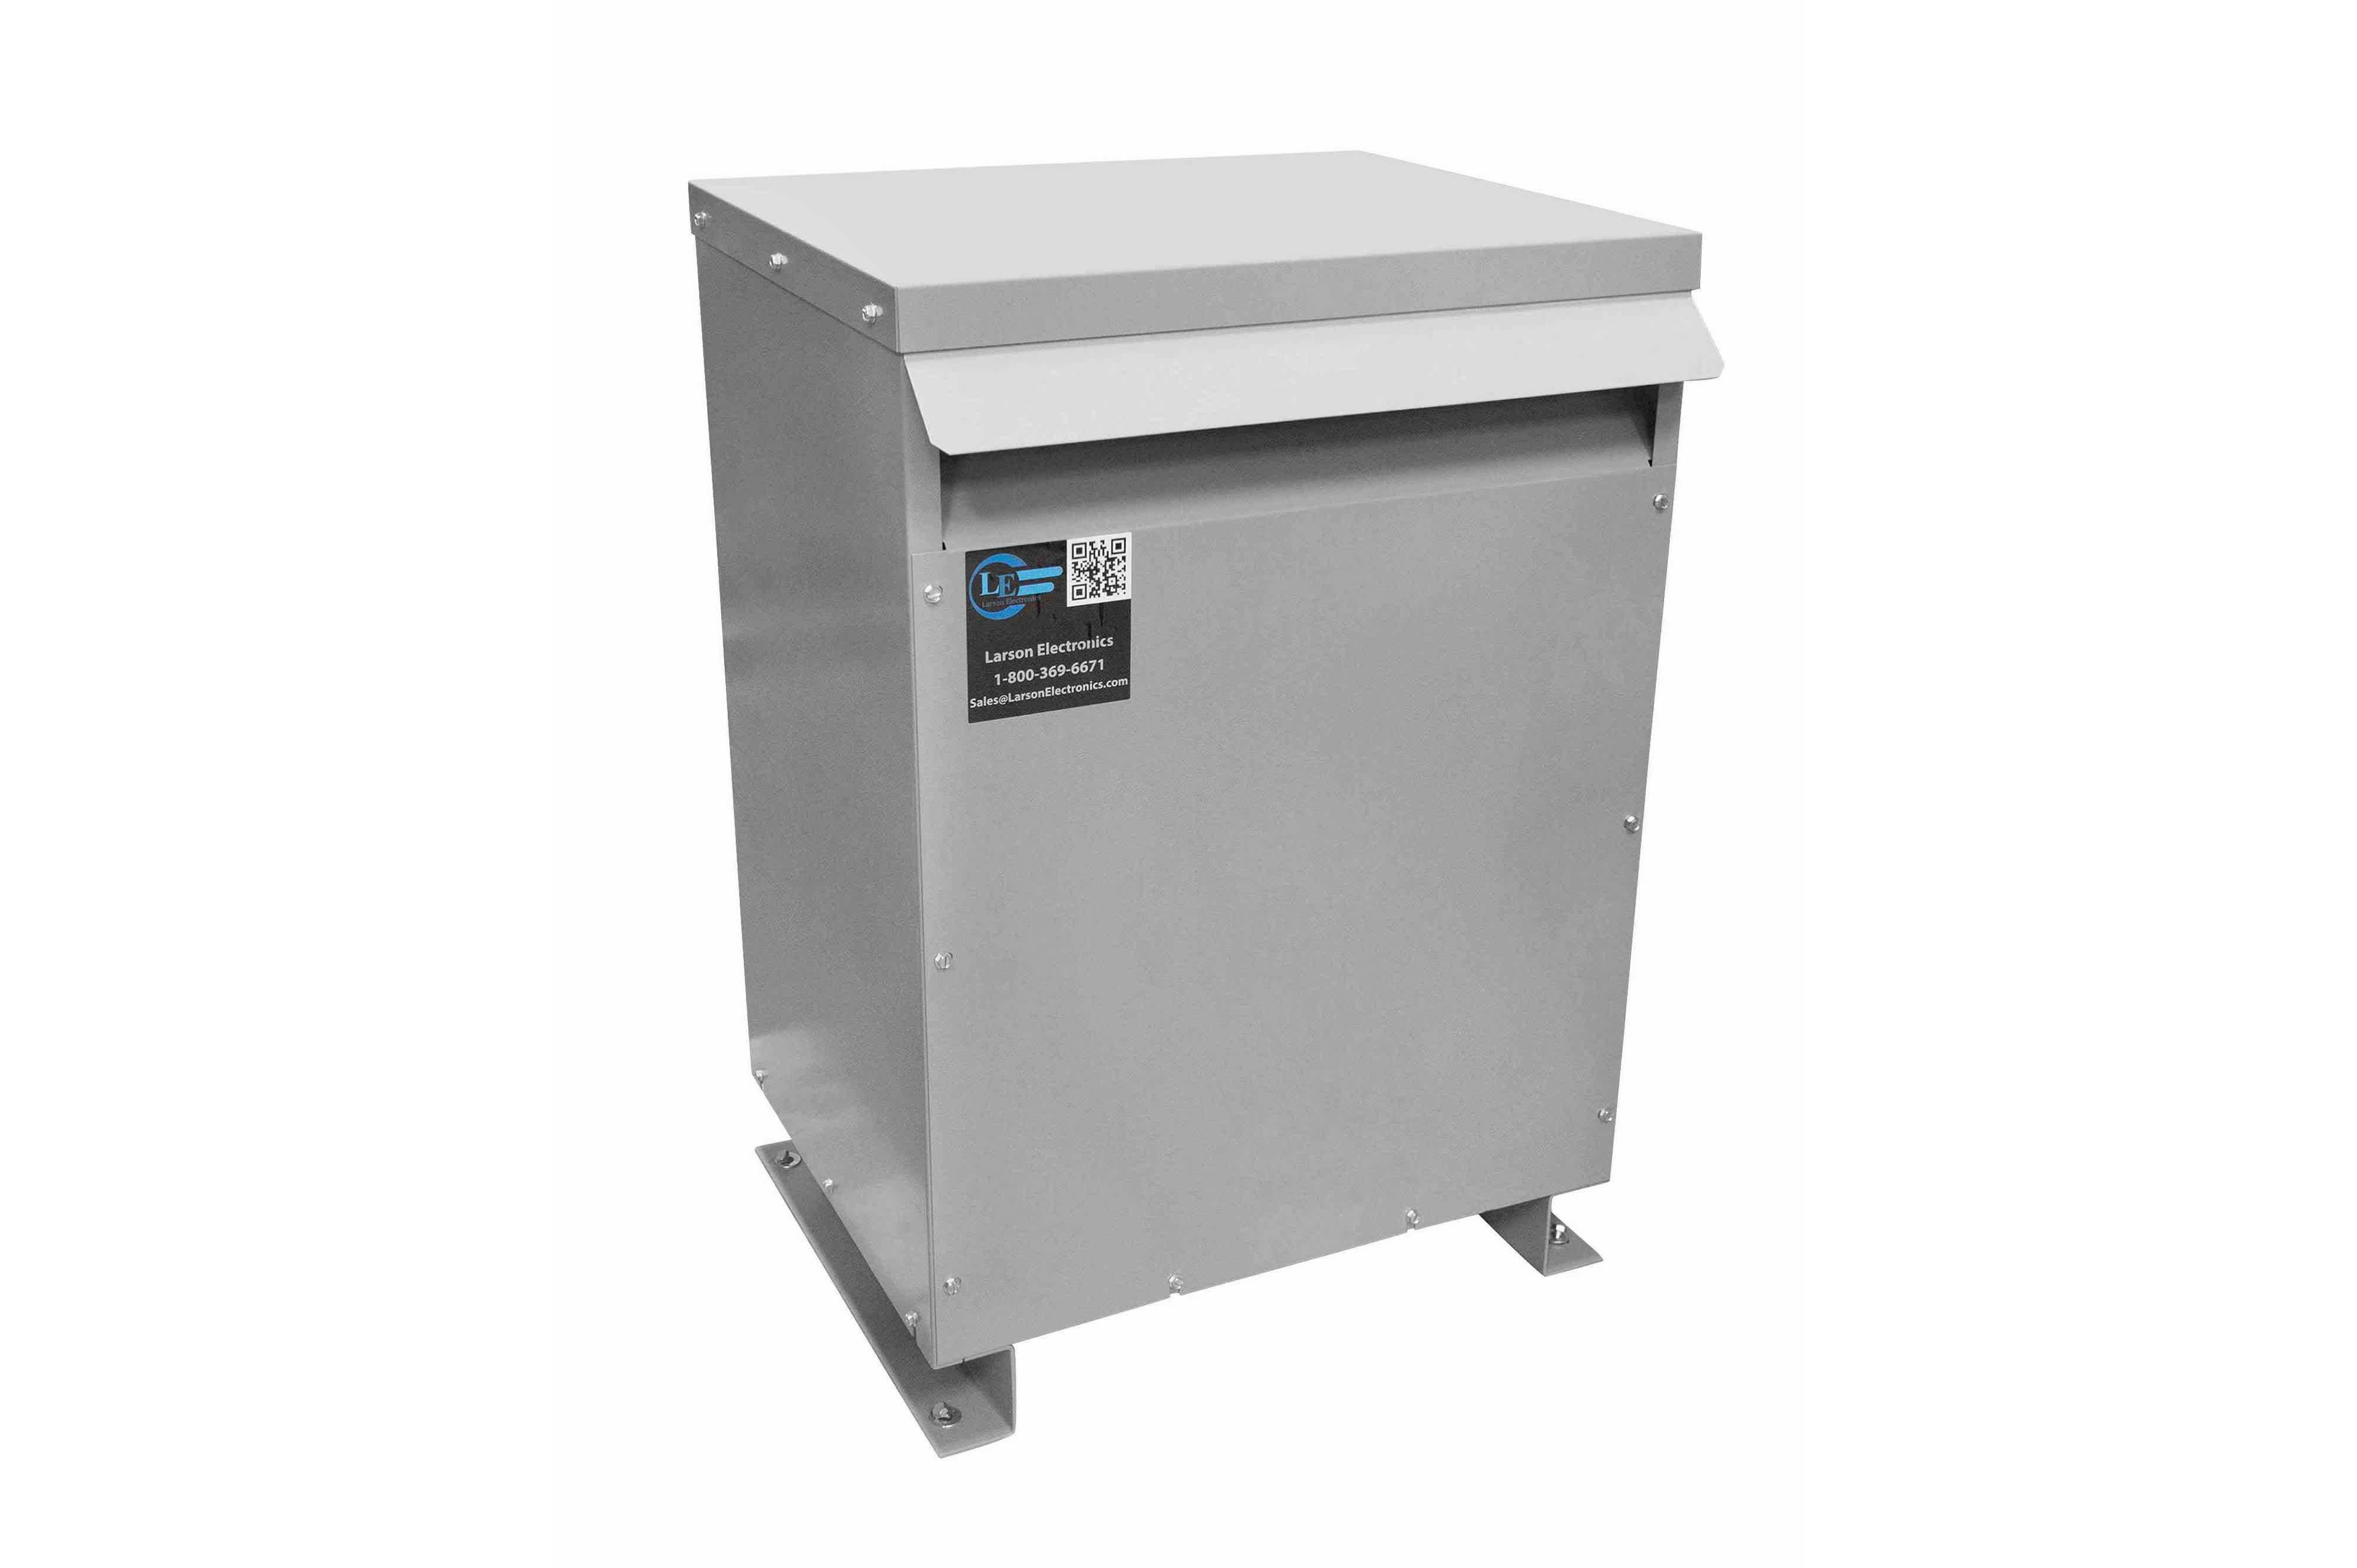 125 kVA 3PH Isolation Transformer, 480V Wye Primary, 400V Delta Secondary, N3R, Ventilated, 60 Hz